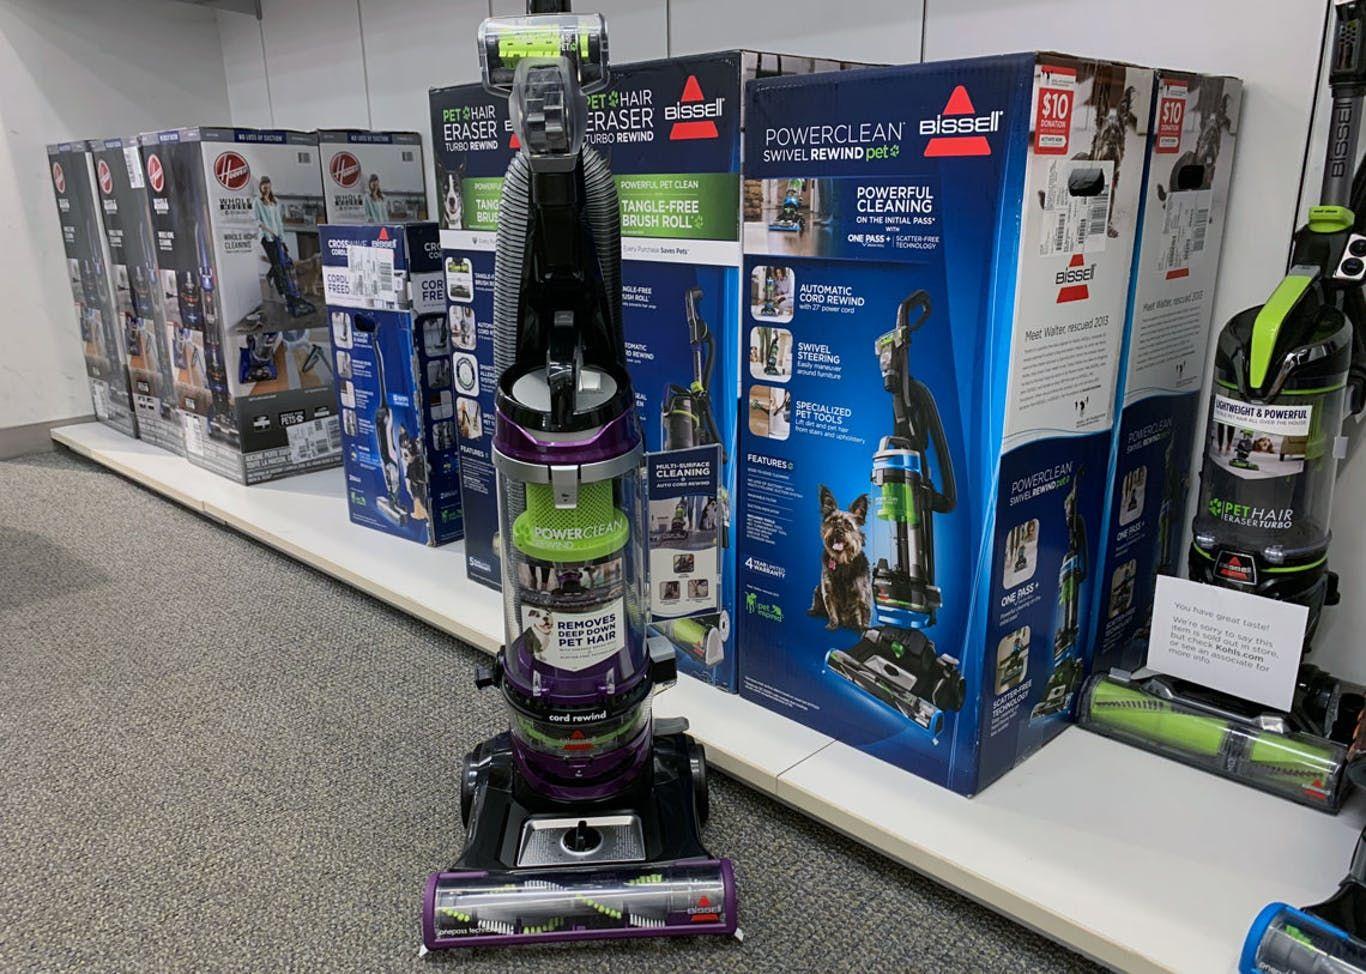 Savannah Street Sweeper Christmas 2020 Walmart Weekly Coupon Deals: Sept. 27   Oct. 3 in 2020   Dollar